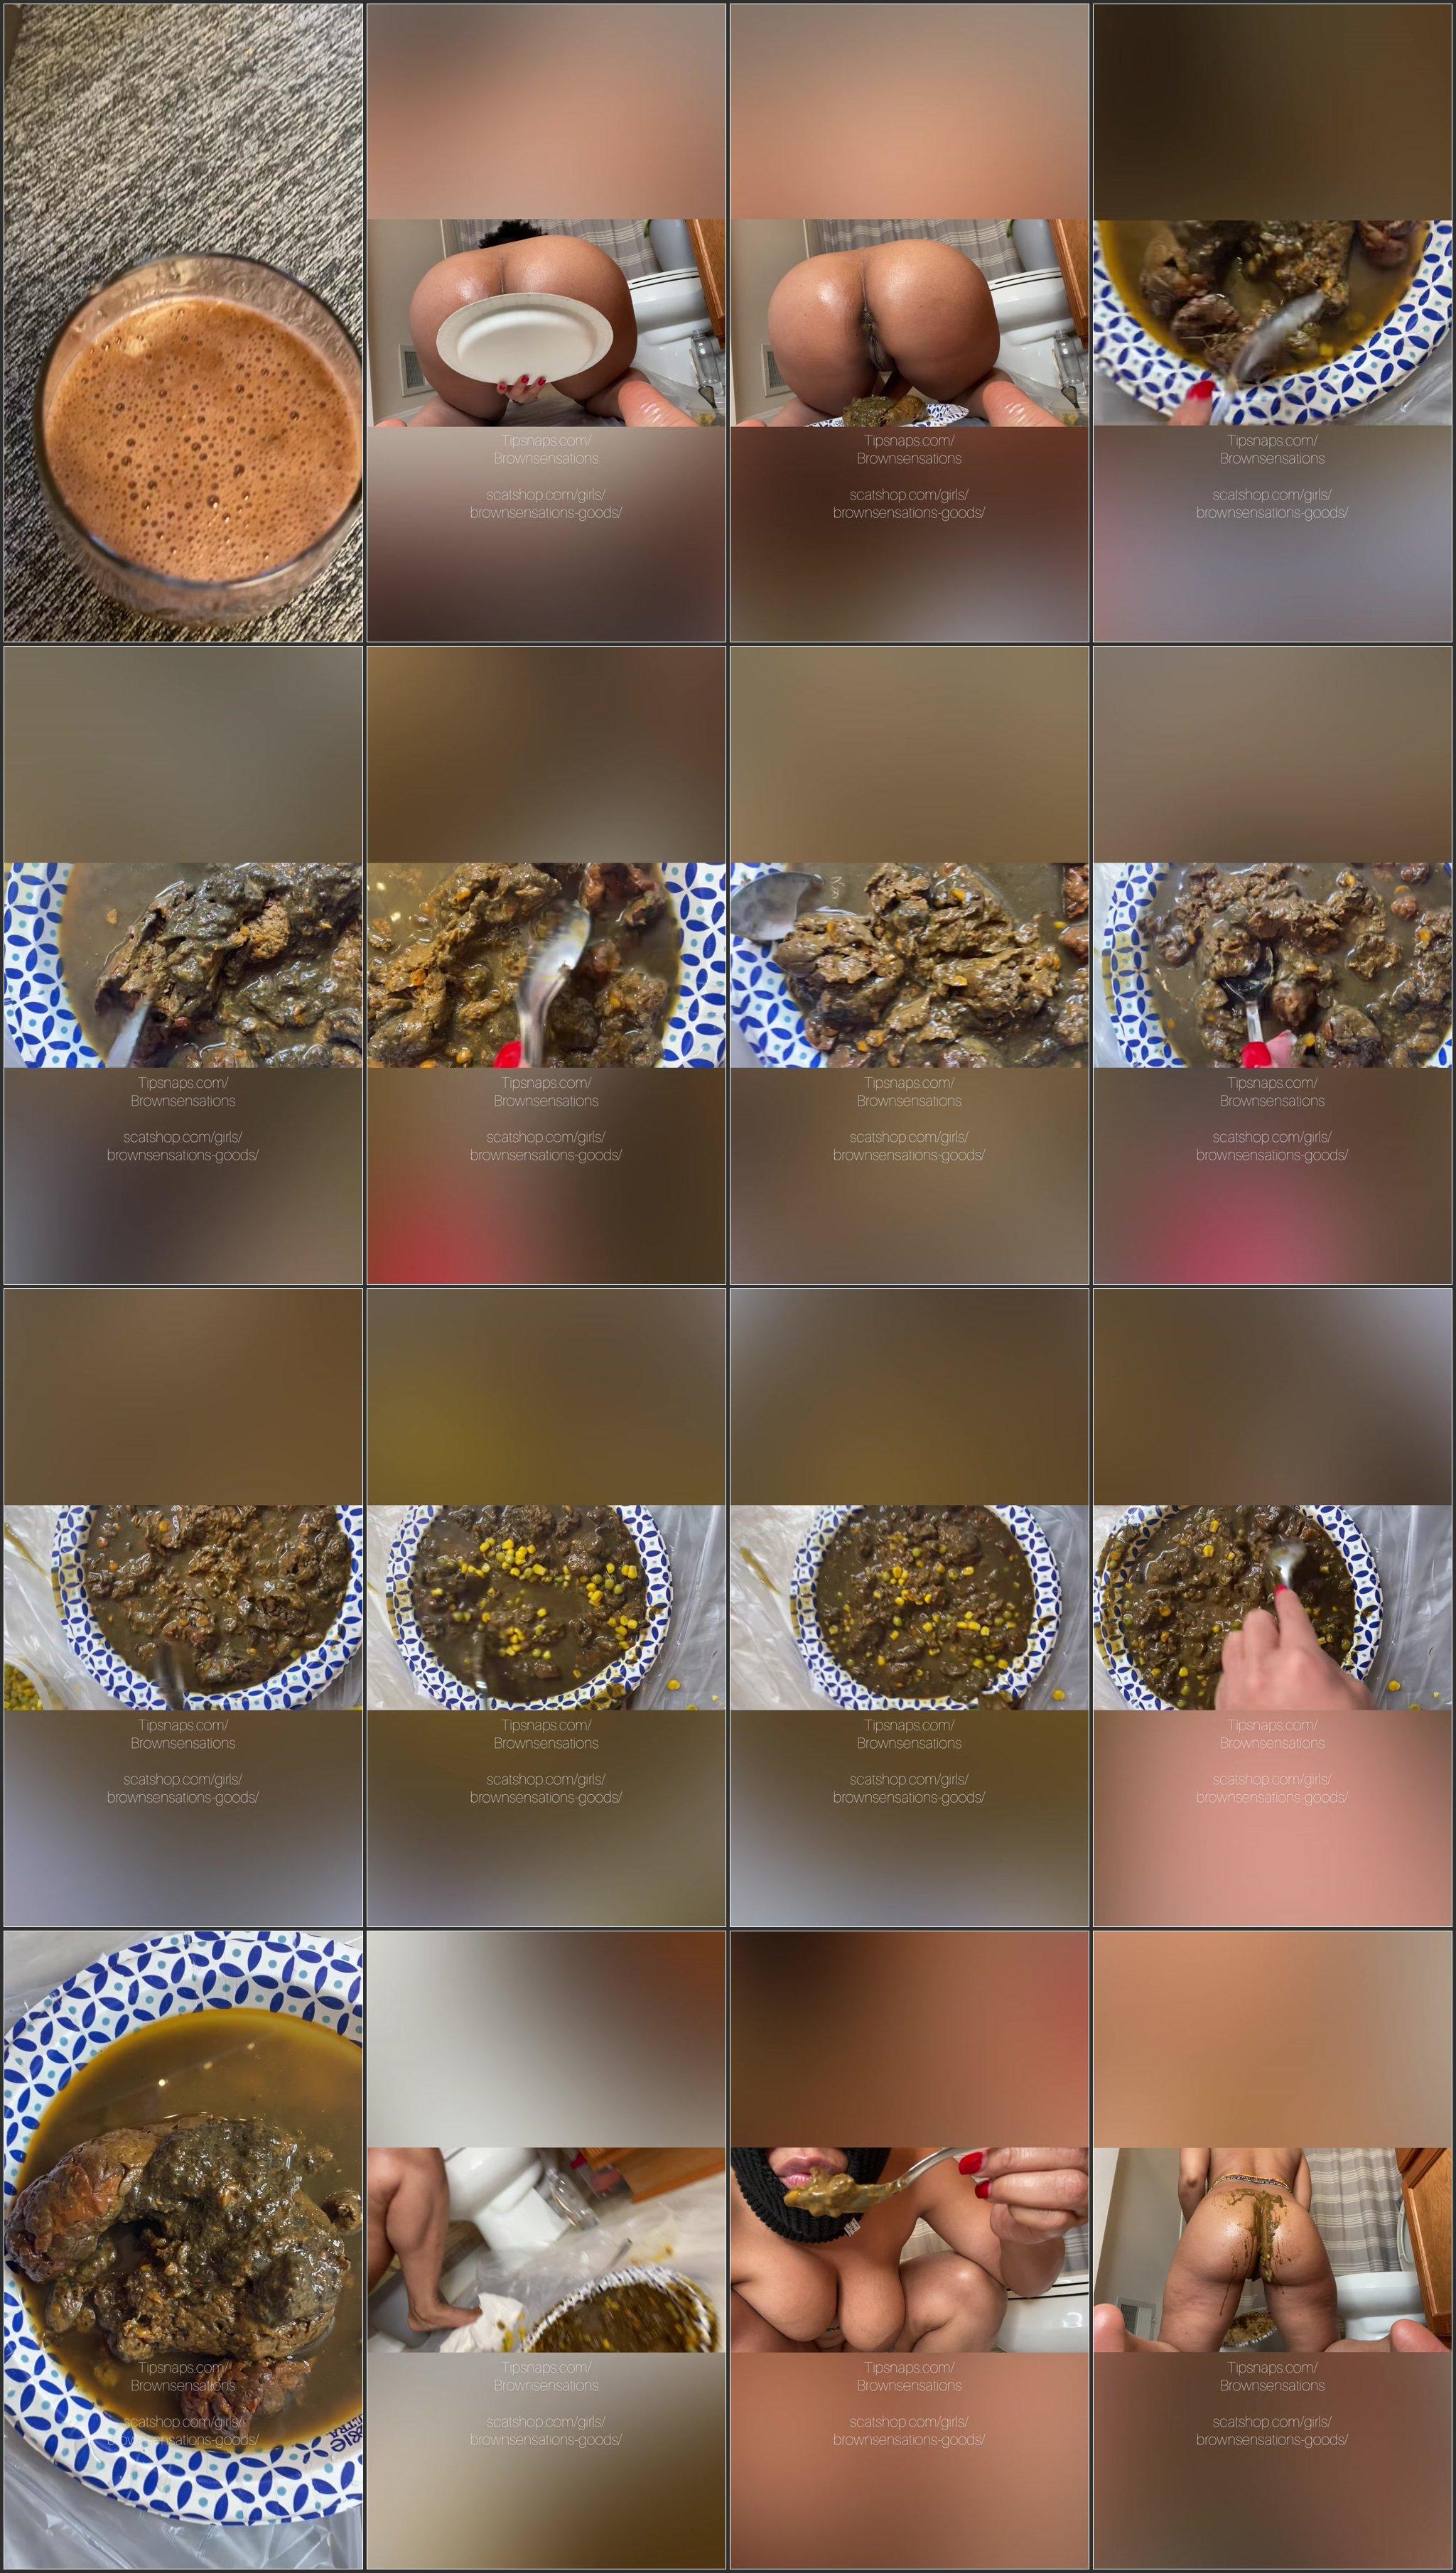 Brownsensations - Smearing My Dinner.ScrinList